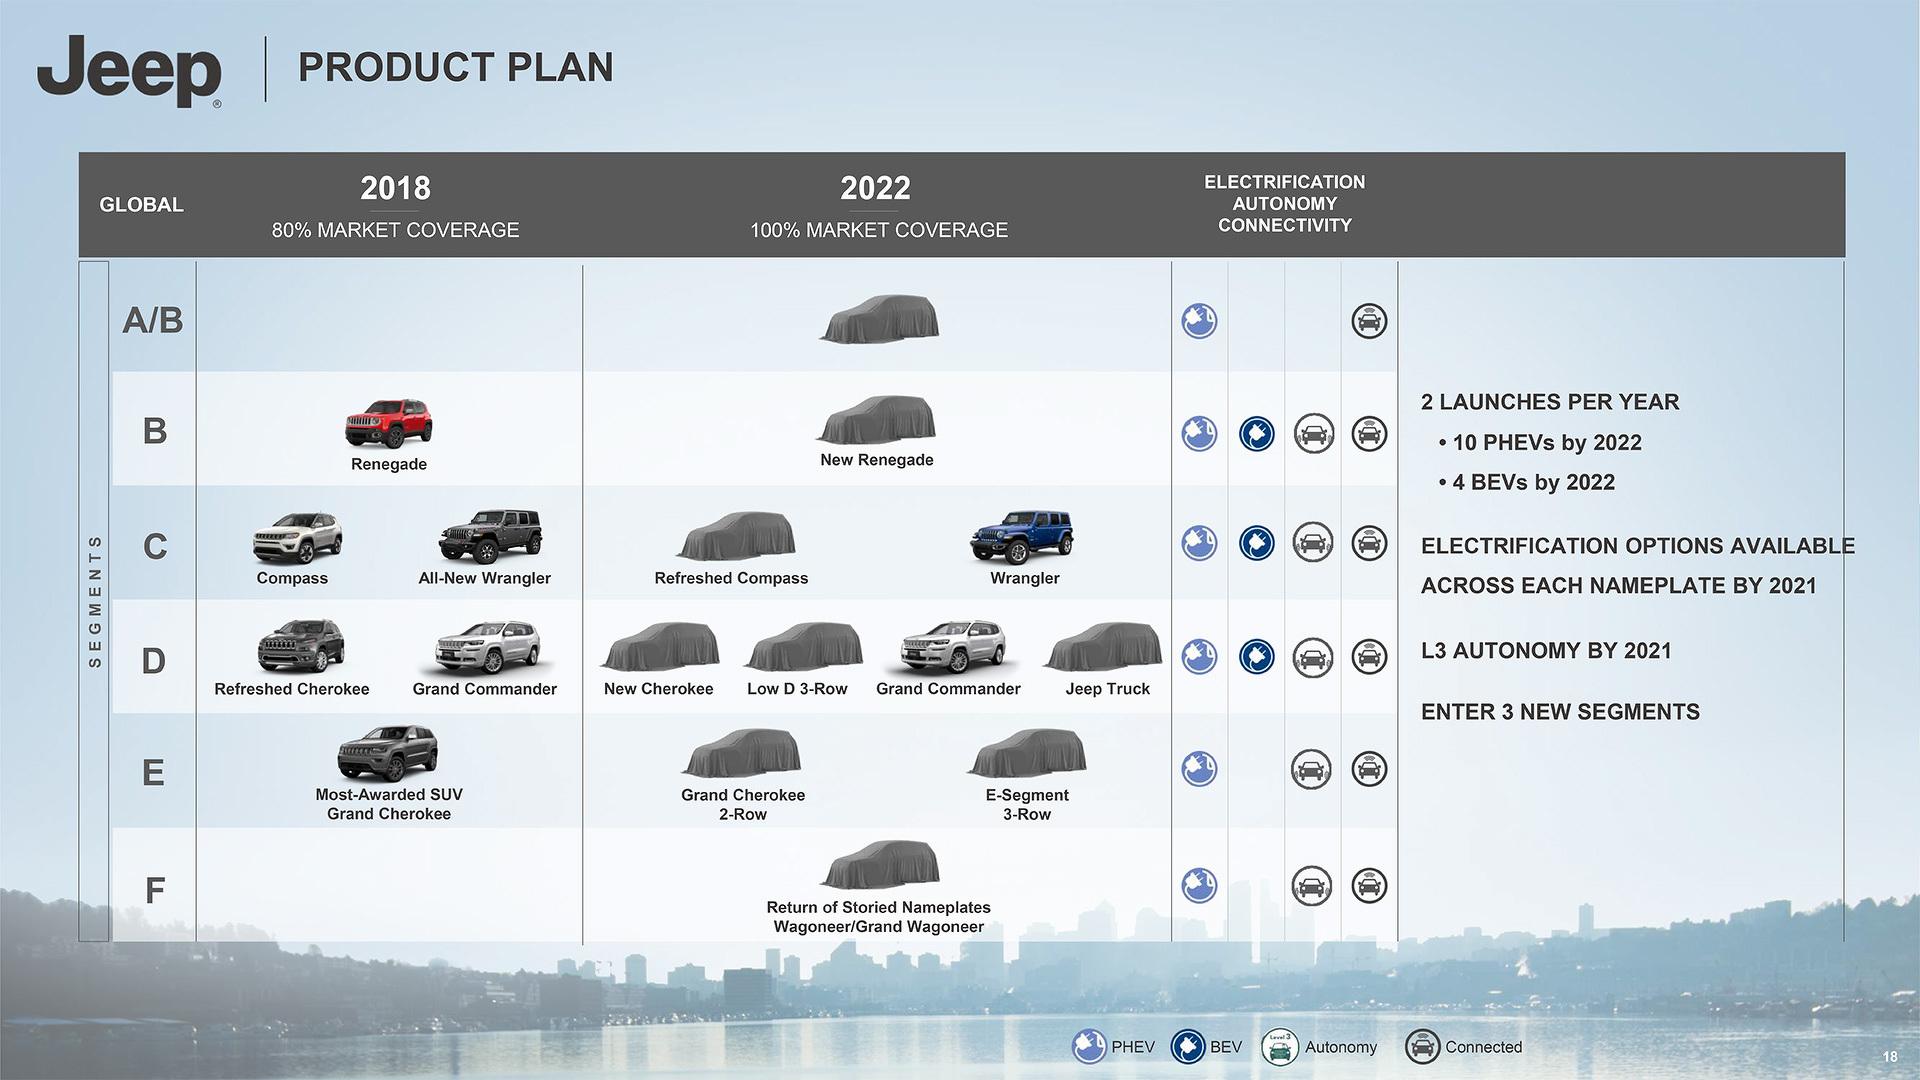 Jeep Plano 2018-2022